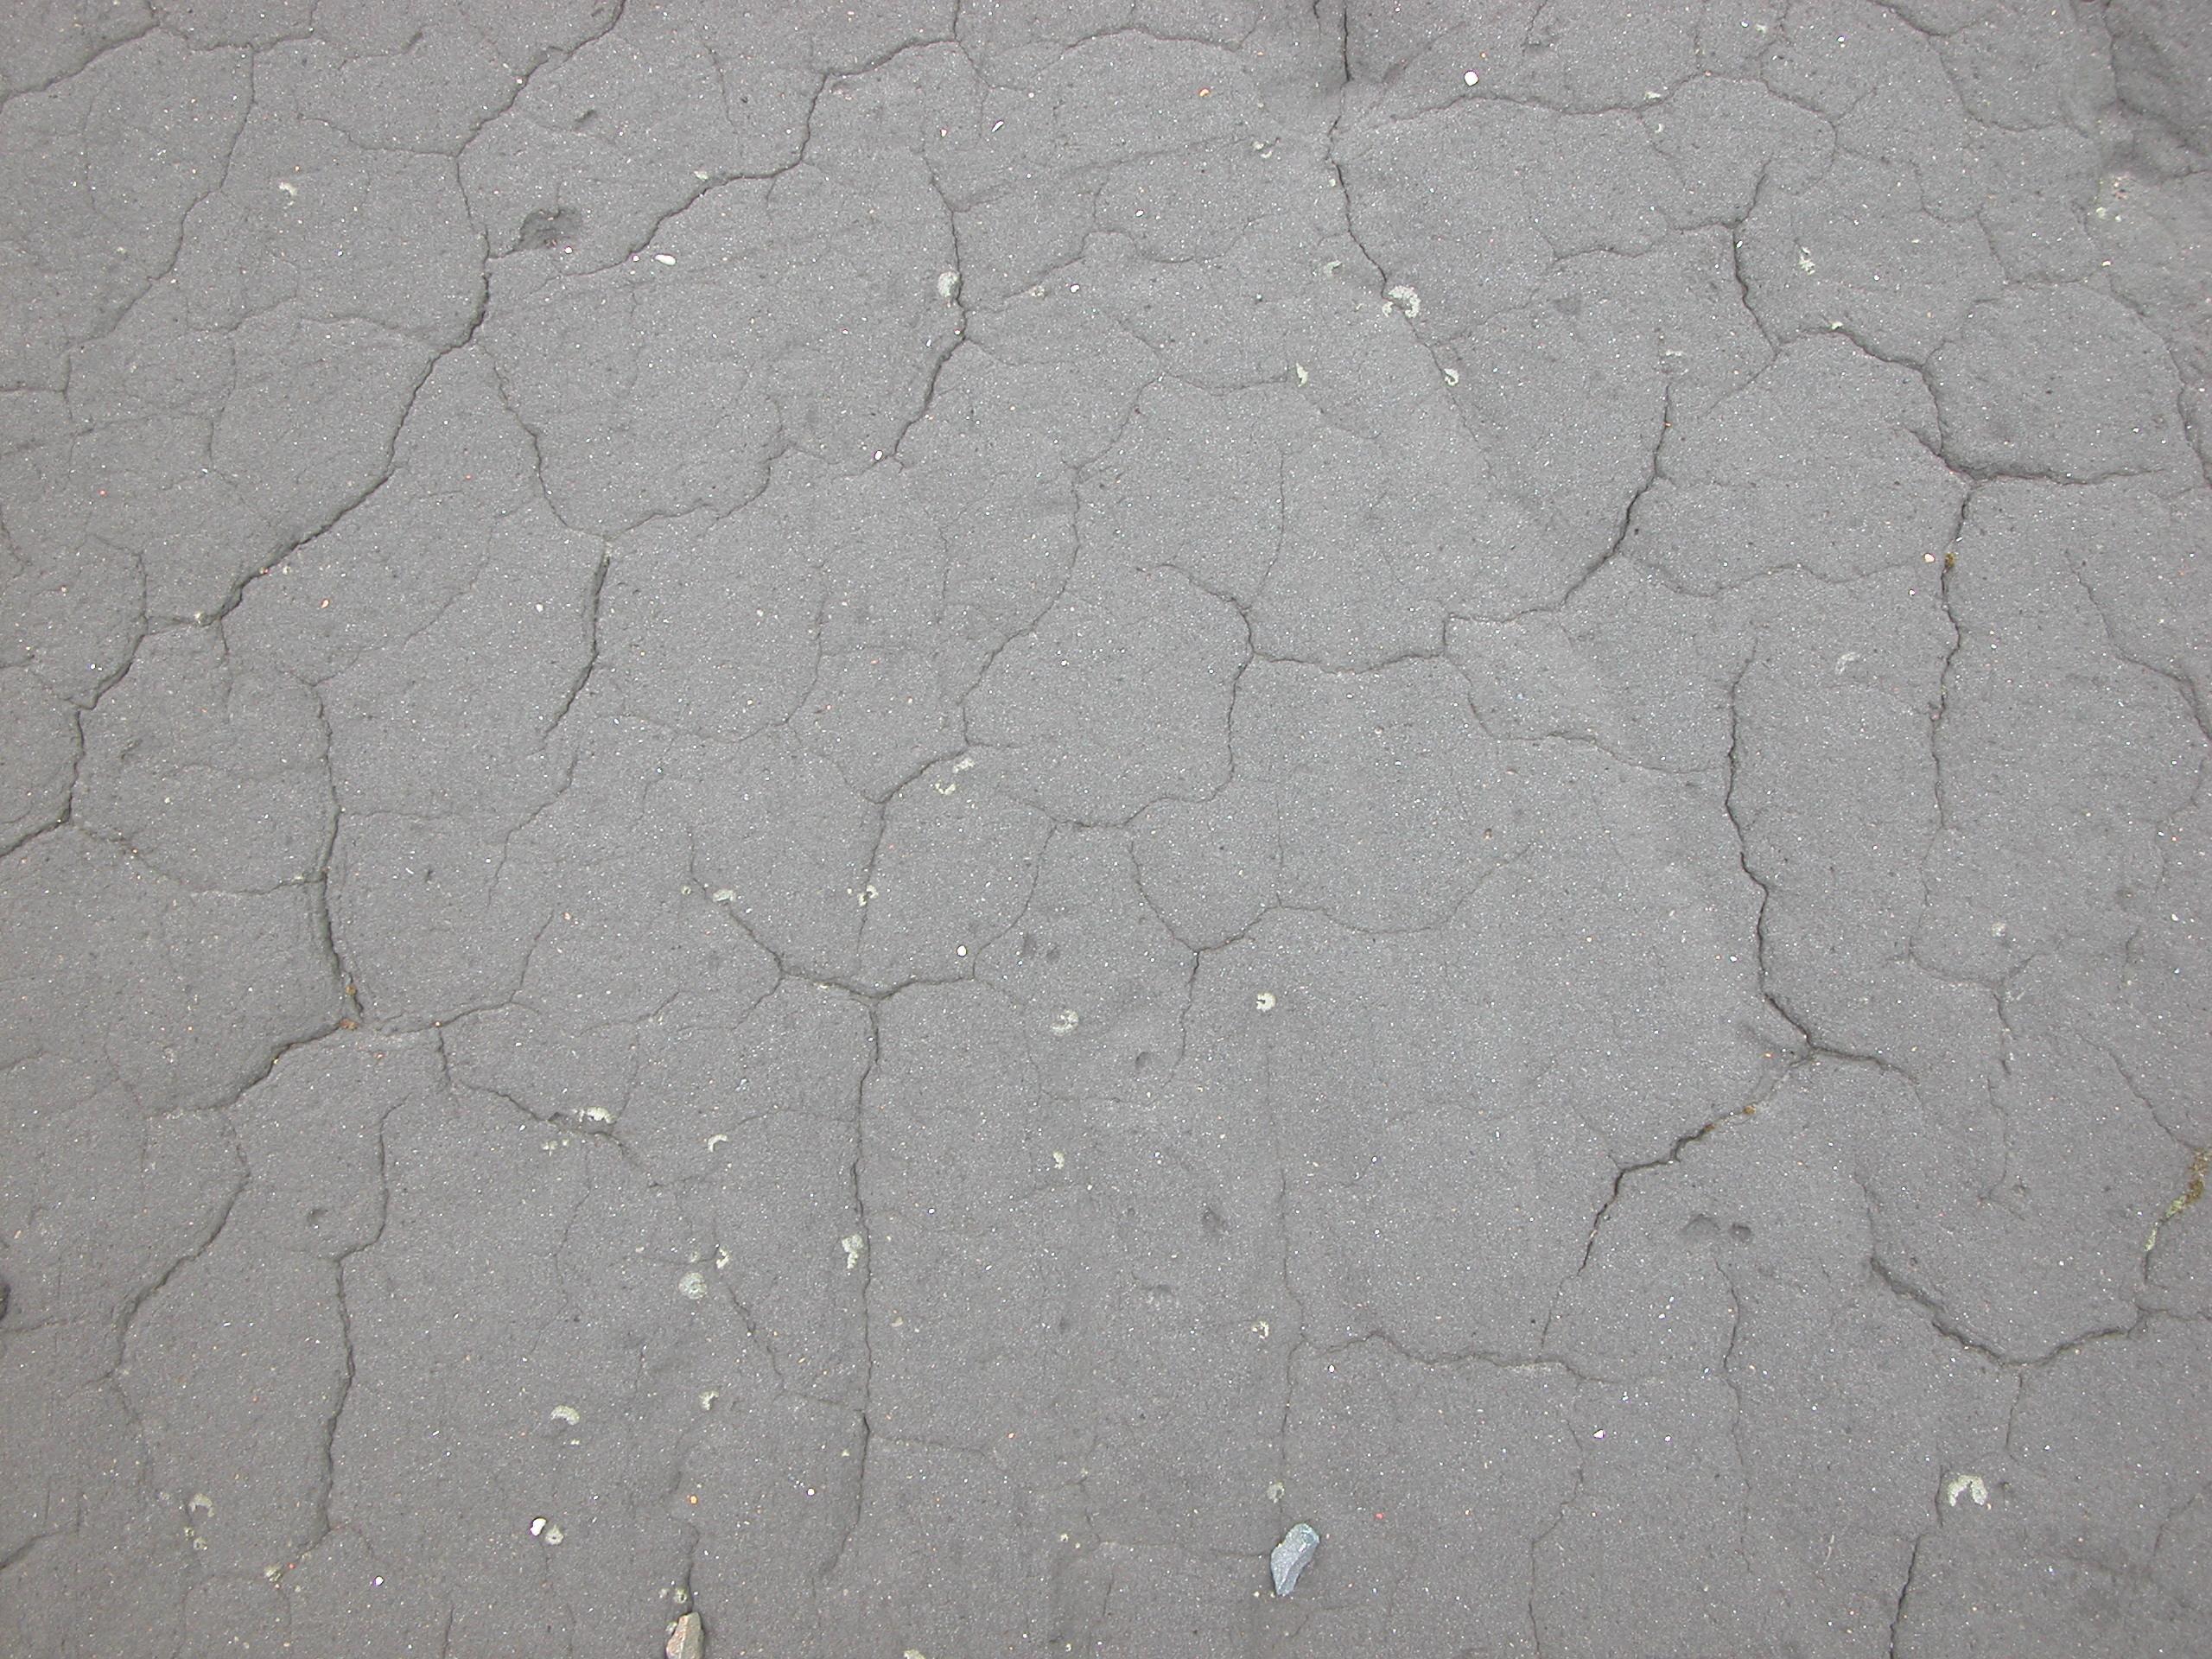 grounds textures black tar asphalt cracked cracks